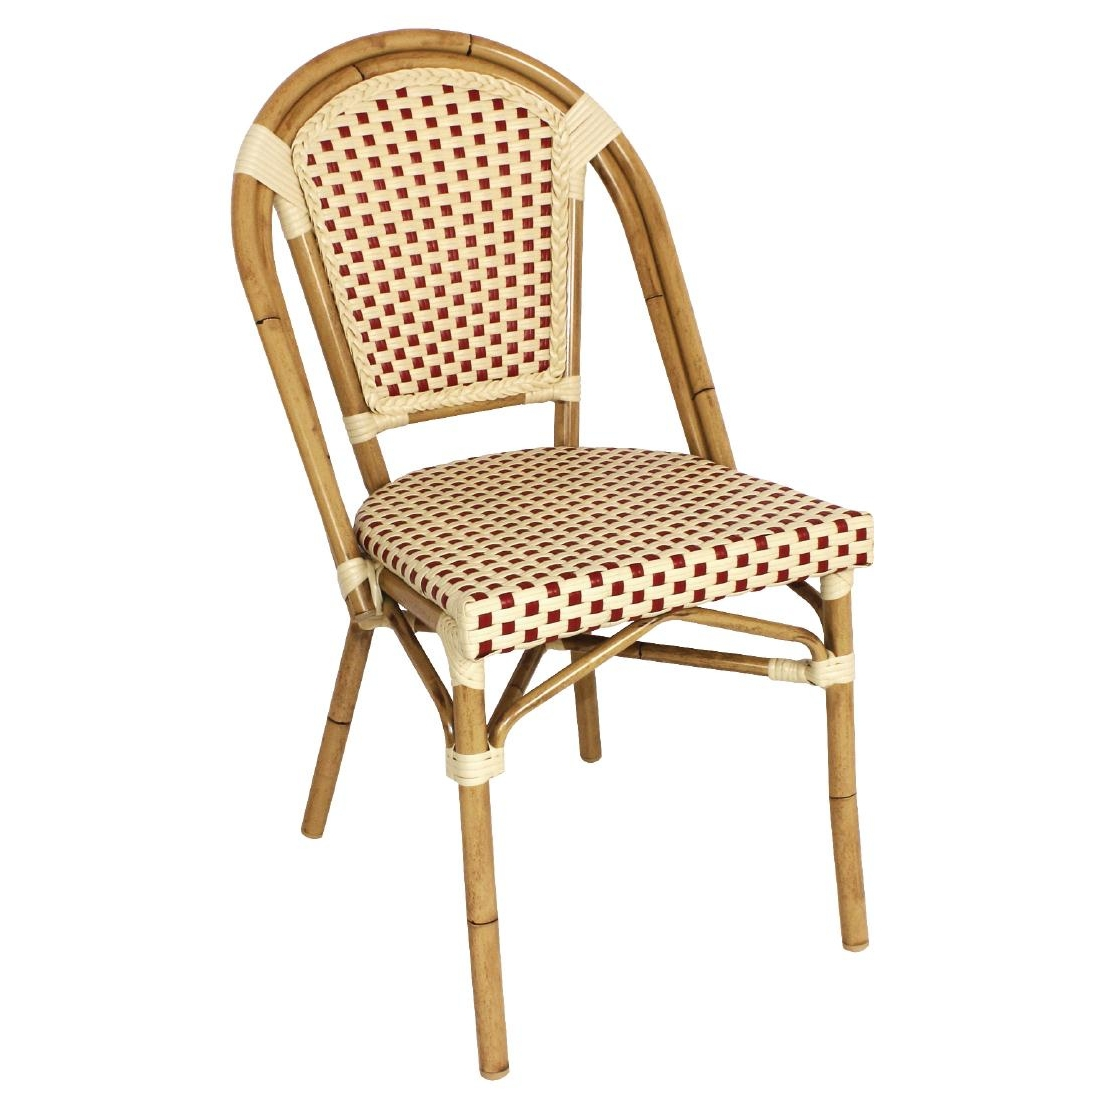 outdoor stuhl krista 305st rot beige g nstig kaufen m bel star. Black Bedroom Furniture Sets. Home Design Ideas